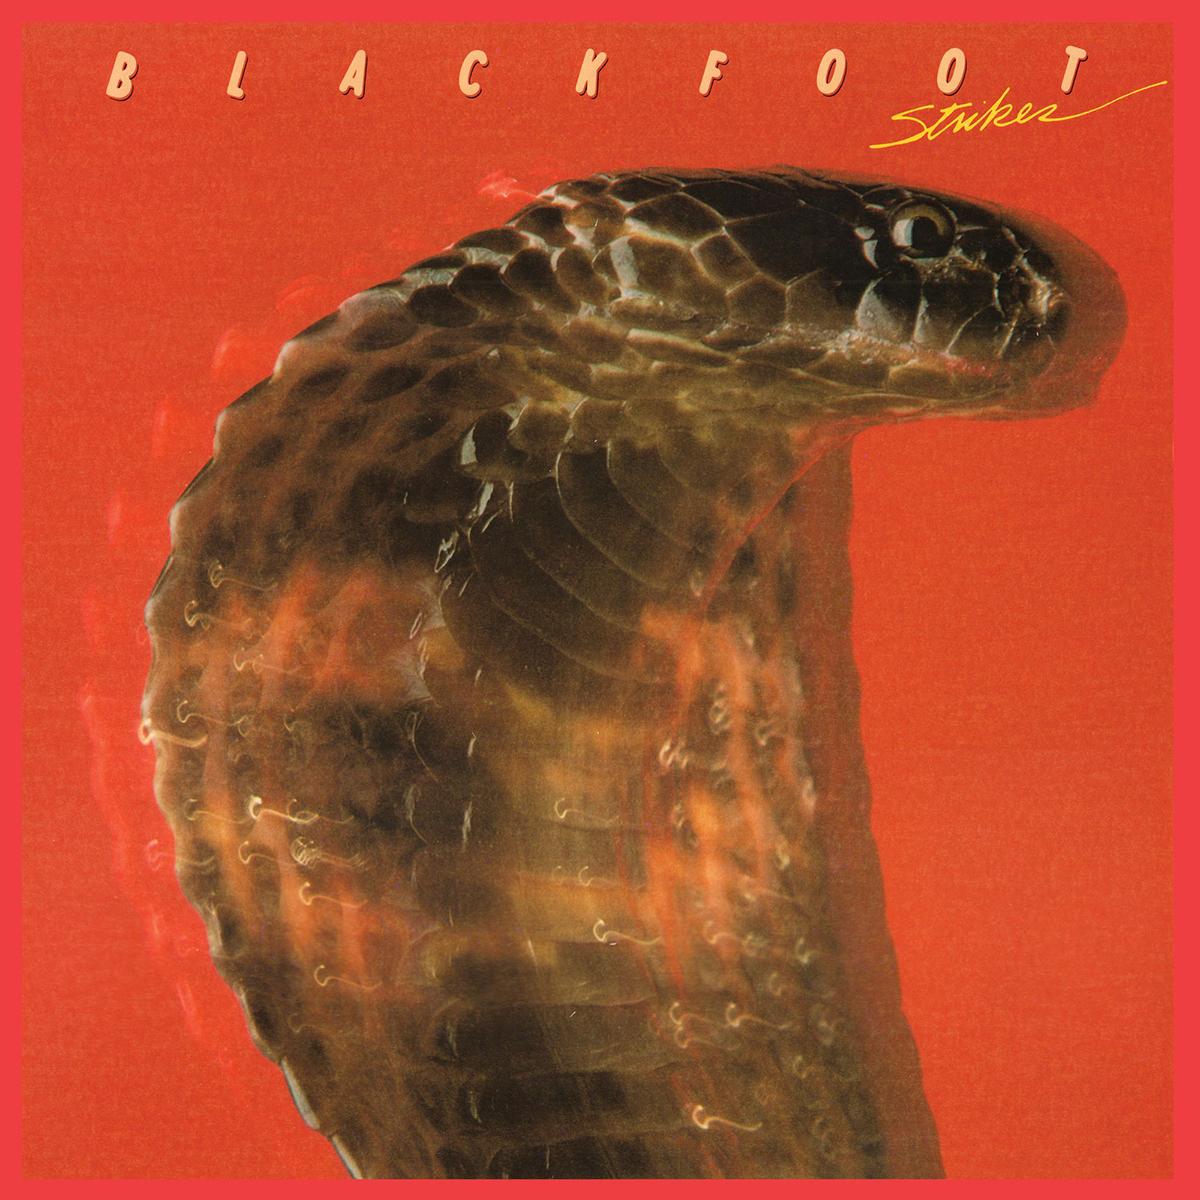 BLACKFOOT - STRIKES 180 GRAM AUDIOPHILE VINYL/LIMITED ANNIVERSARY EDITION LP